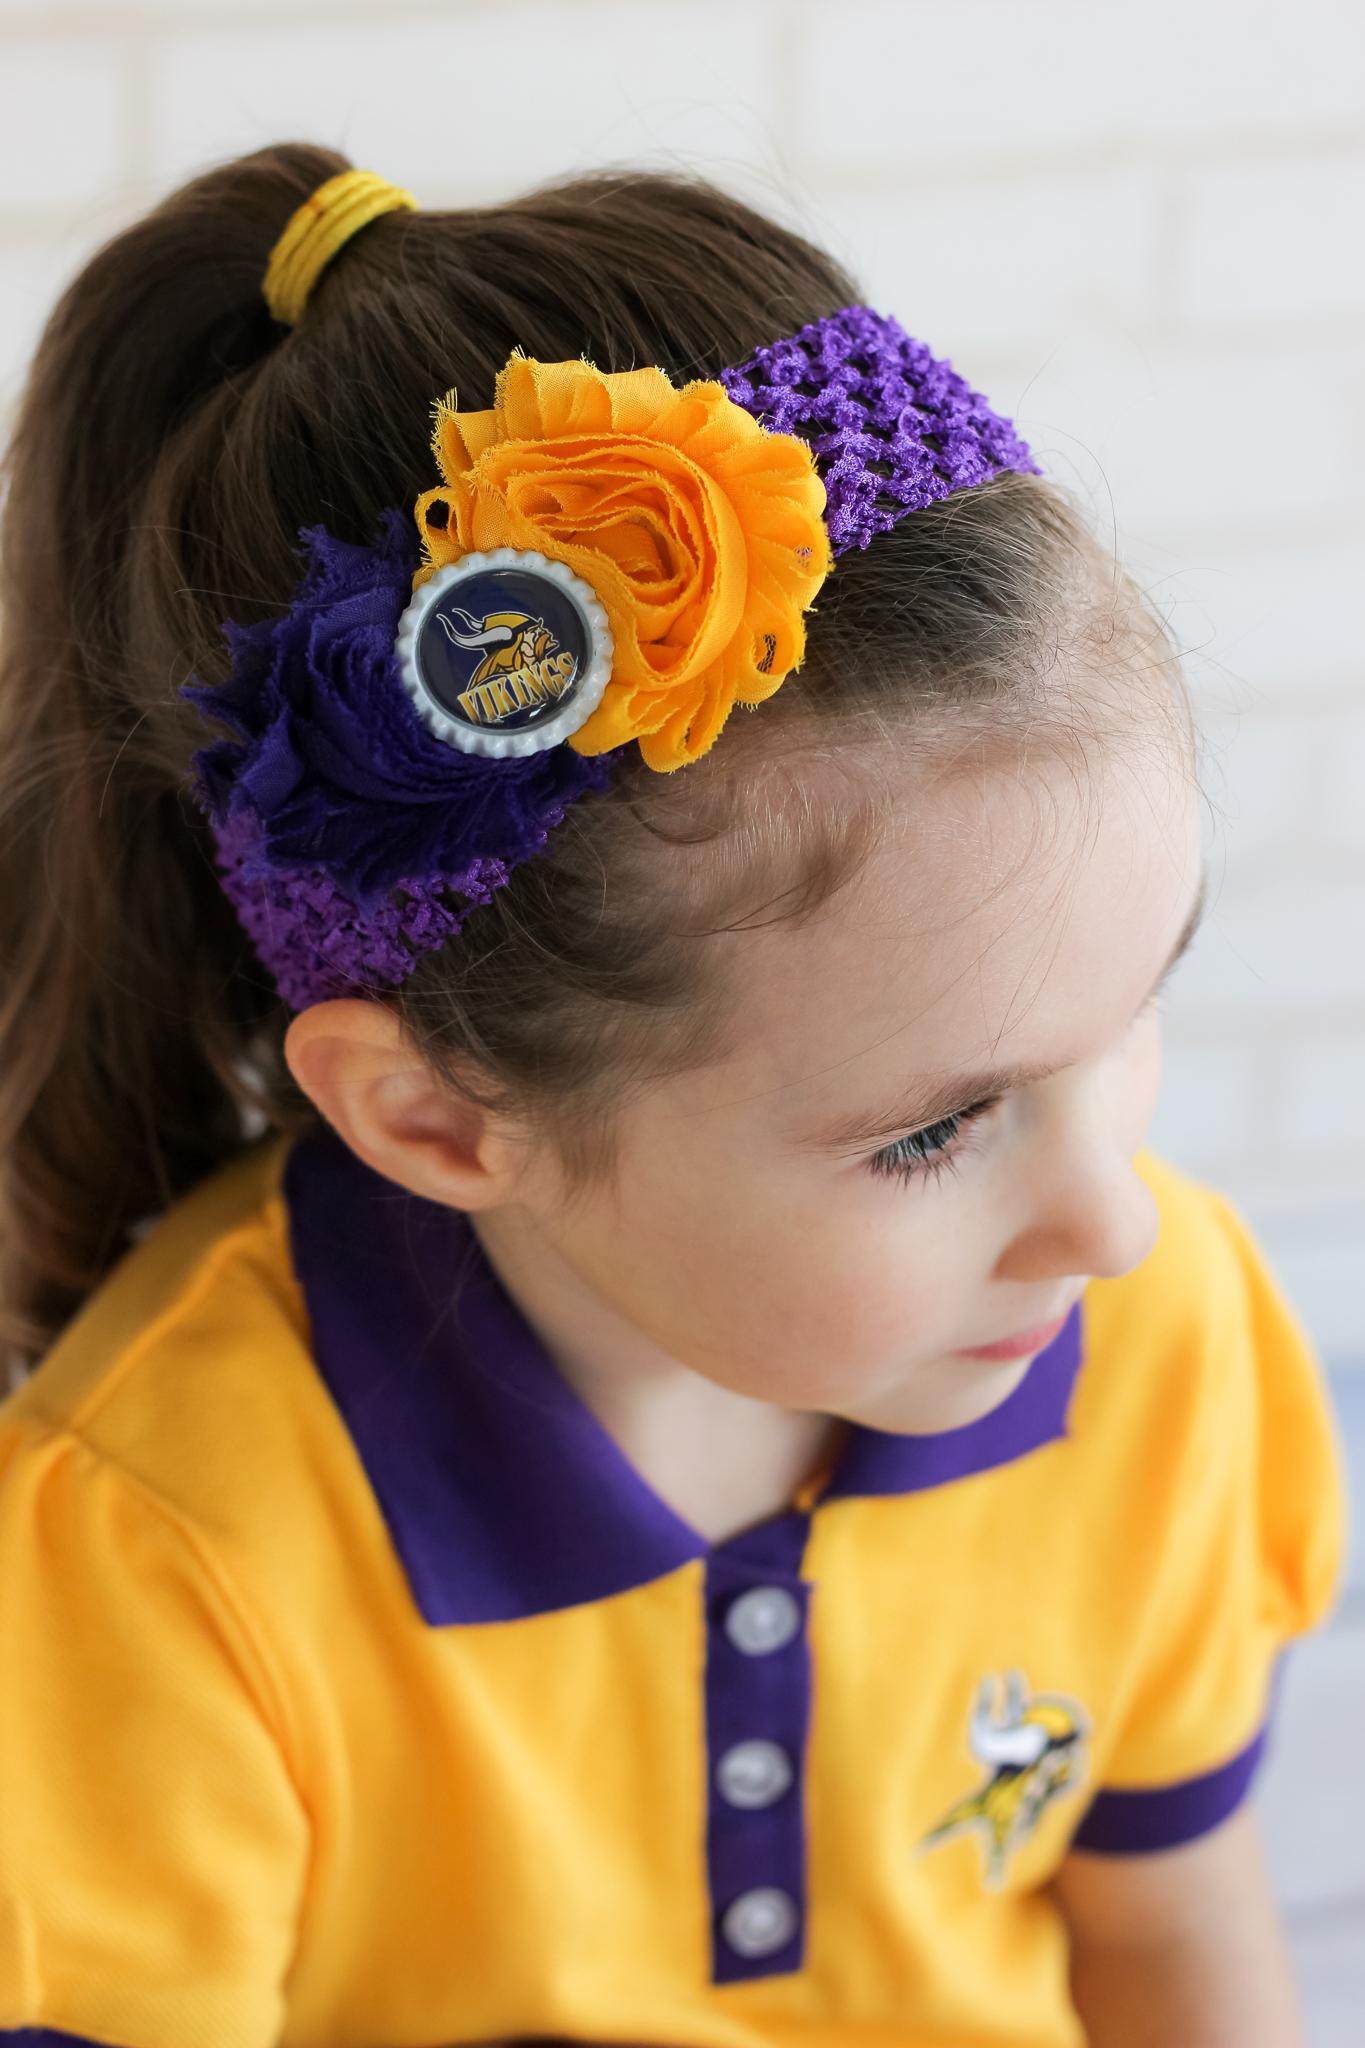 Minnesota Vikings Headband Girls Headbands Baby Toddler Football